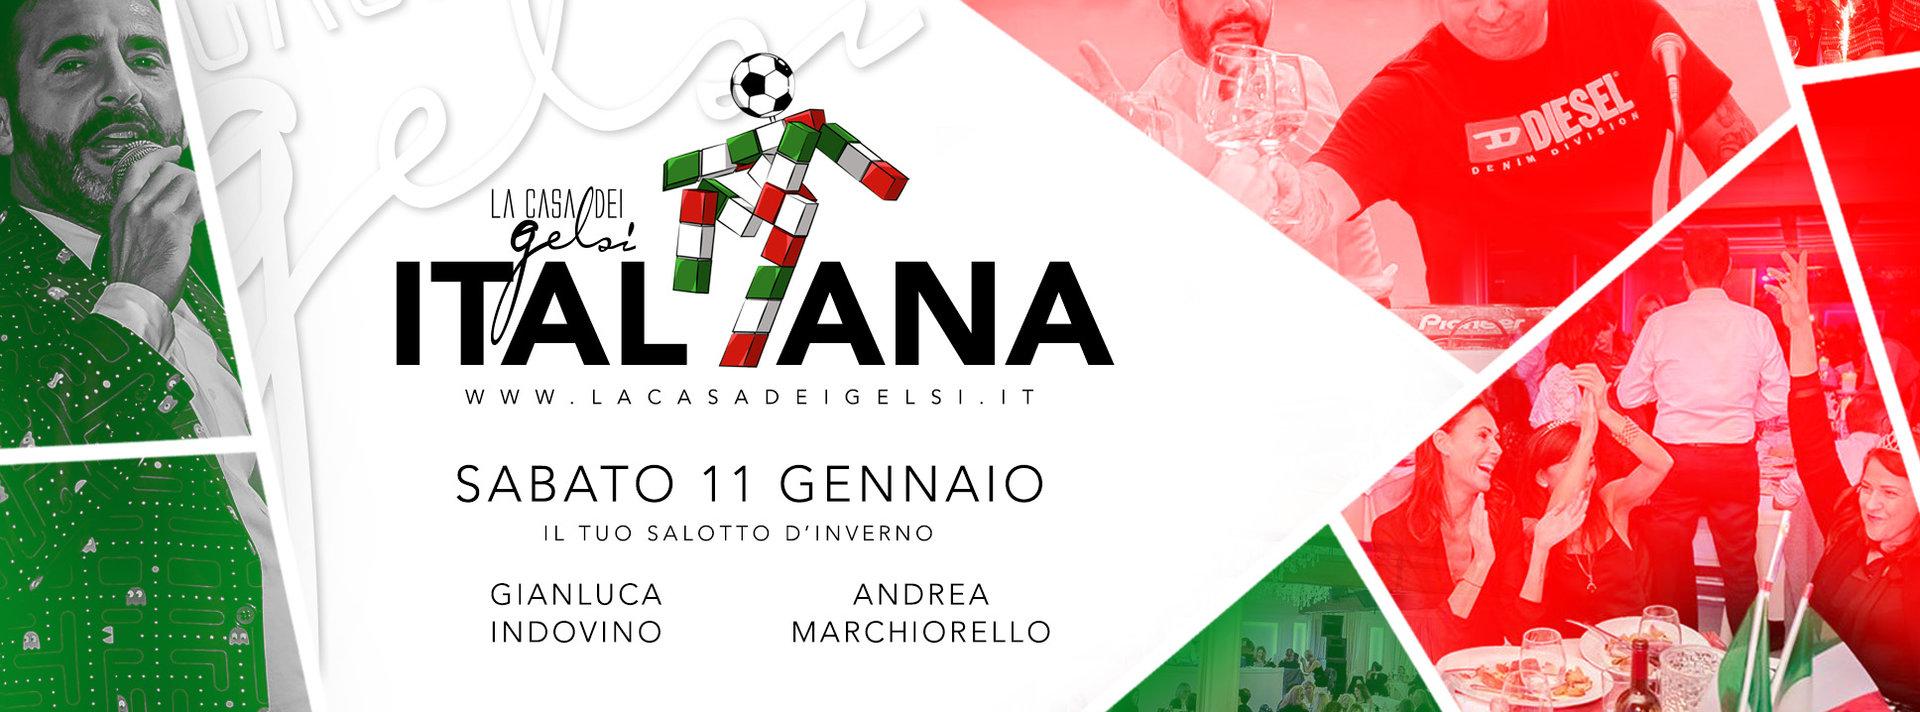 Italiana - 11 gennaio 2020